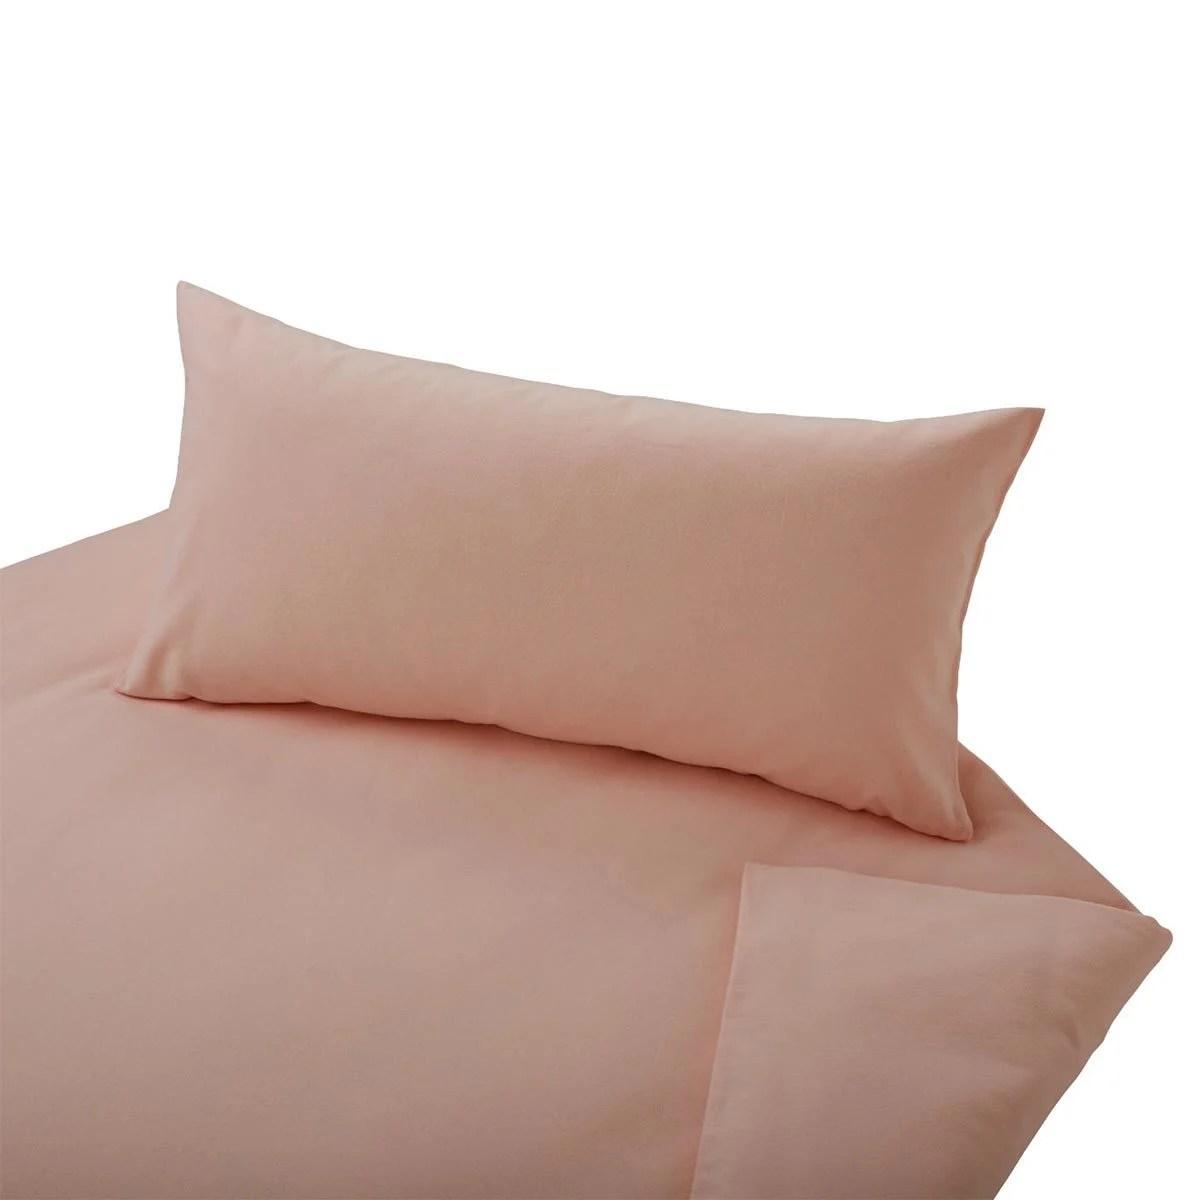 Bettwaesche Falten Anti Falten Bettwäsche